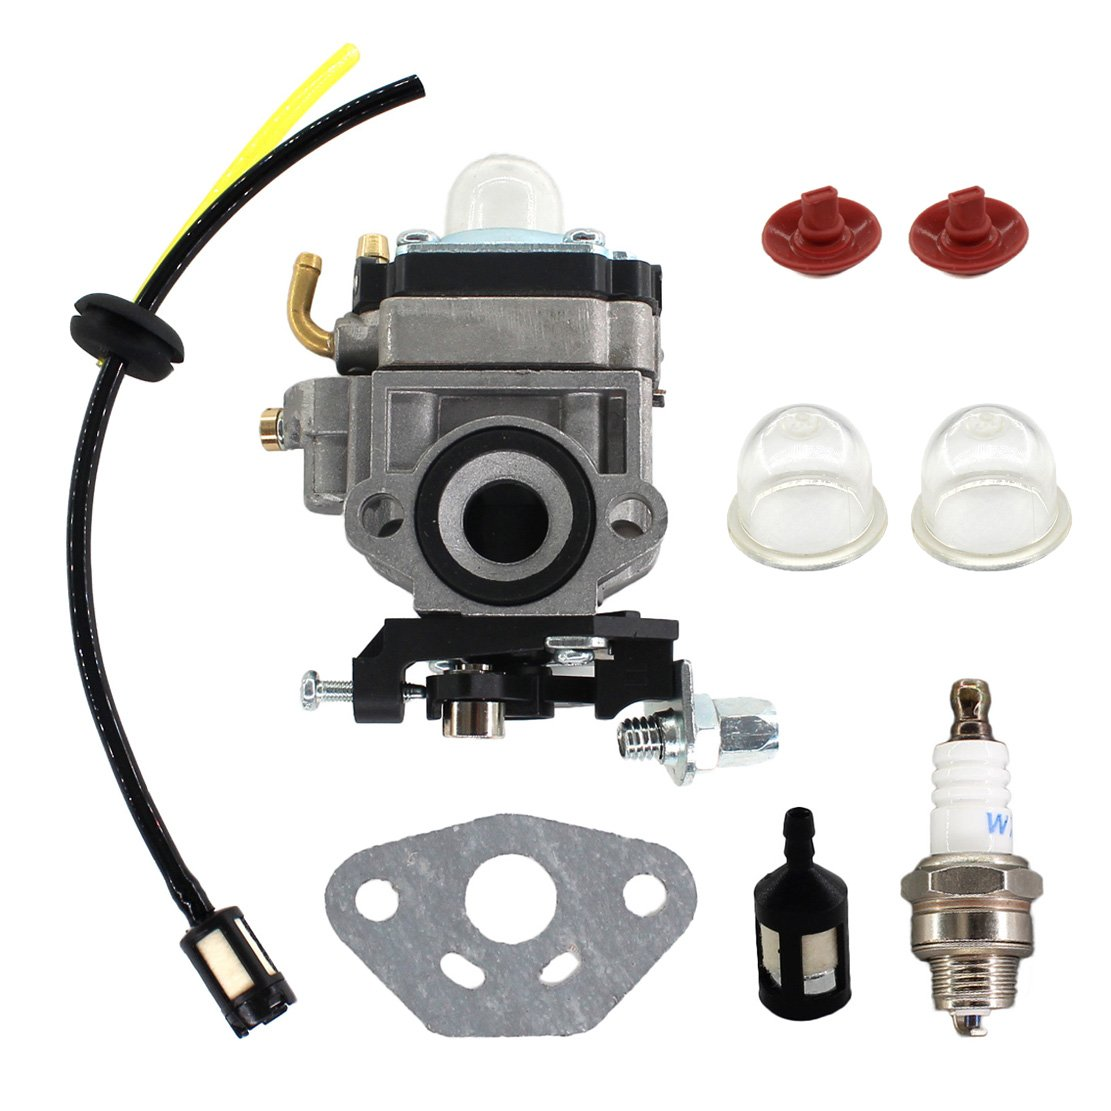 USPEEDA Carburetor for Jiffy 142FV Engine Feldmann Ice Fishing Auger Drill 4381 Fuel Line Spark Plug Check Valve Primer Bulb Carb Gasket